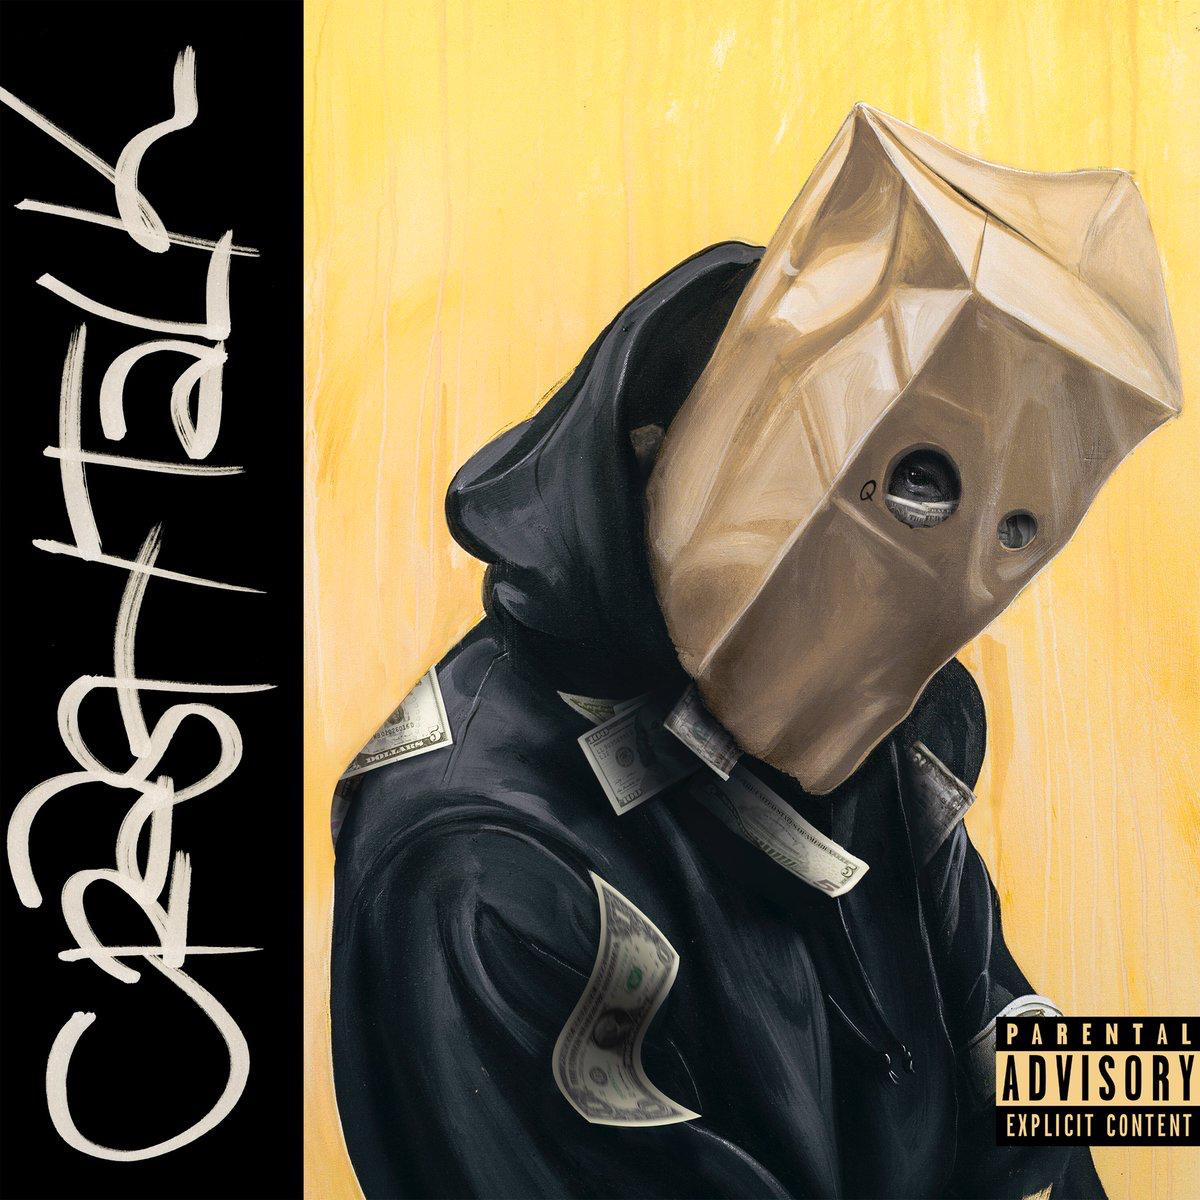 CrasH Talk